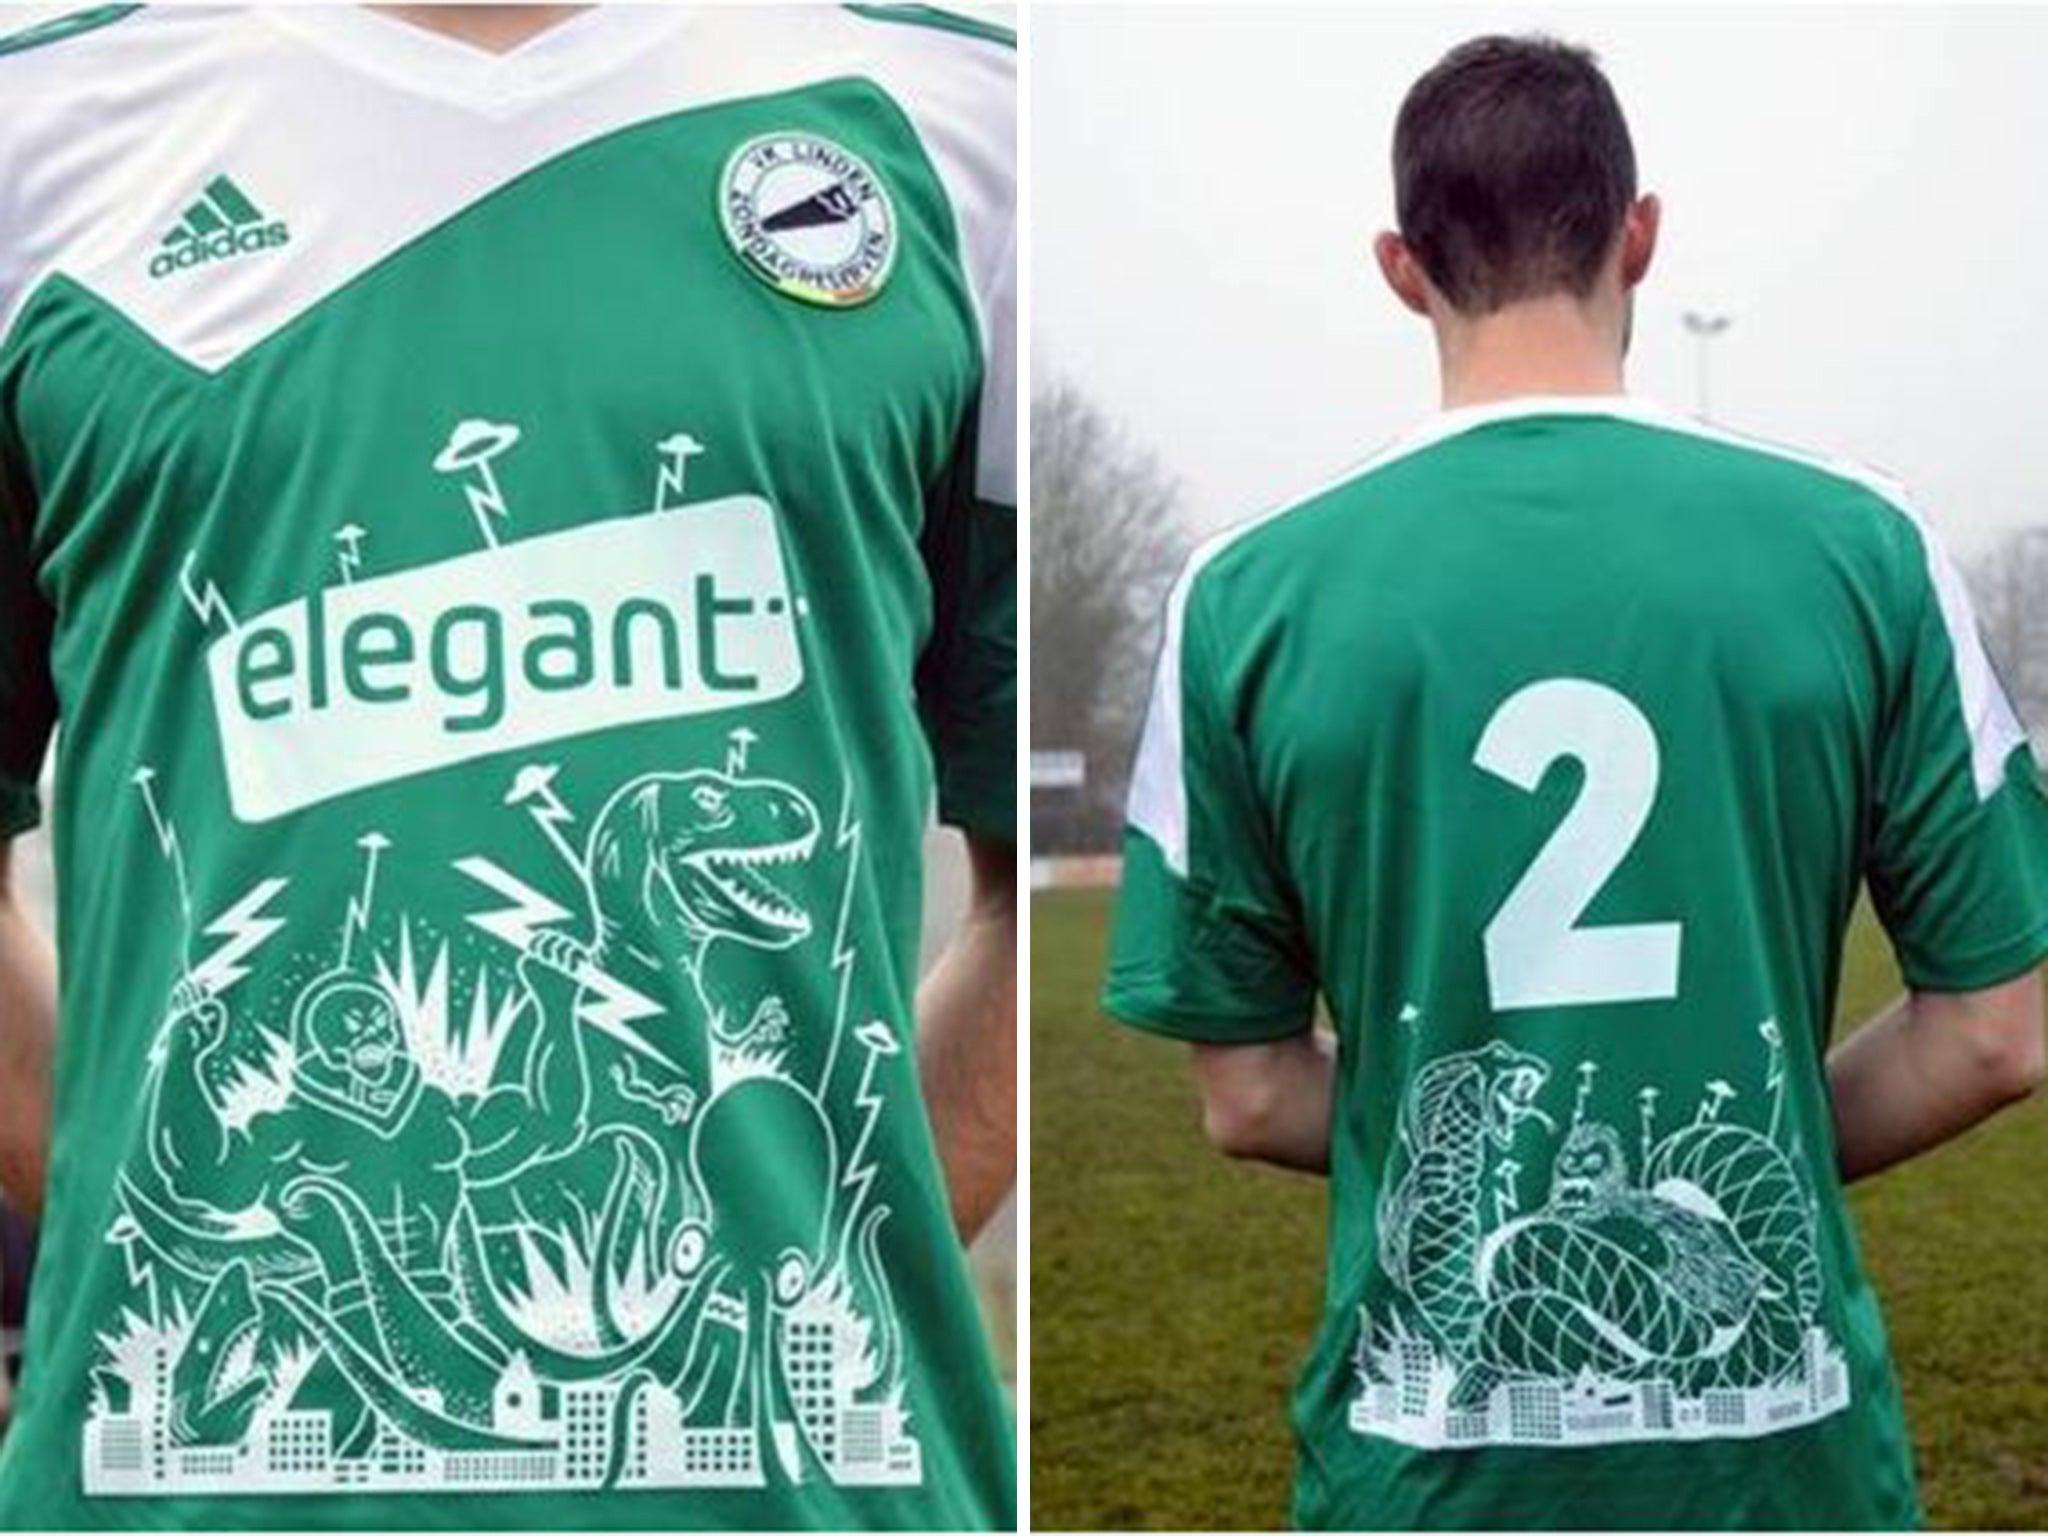 belgian sunday league team vk linden have brilliant shirts belgian sunday league team vk linden have brilliant shirts designed by cartoonist jeroom snelders the independent